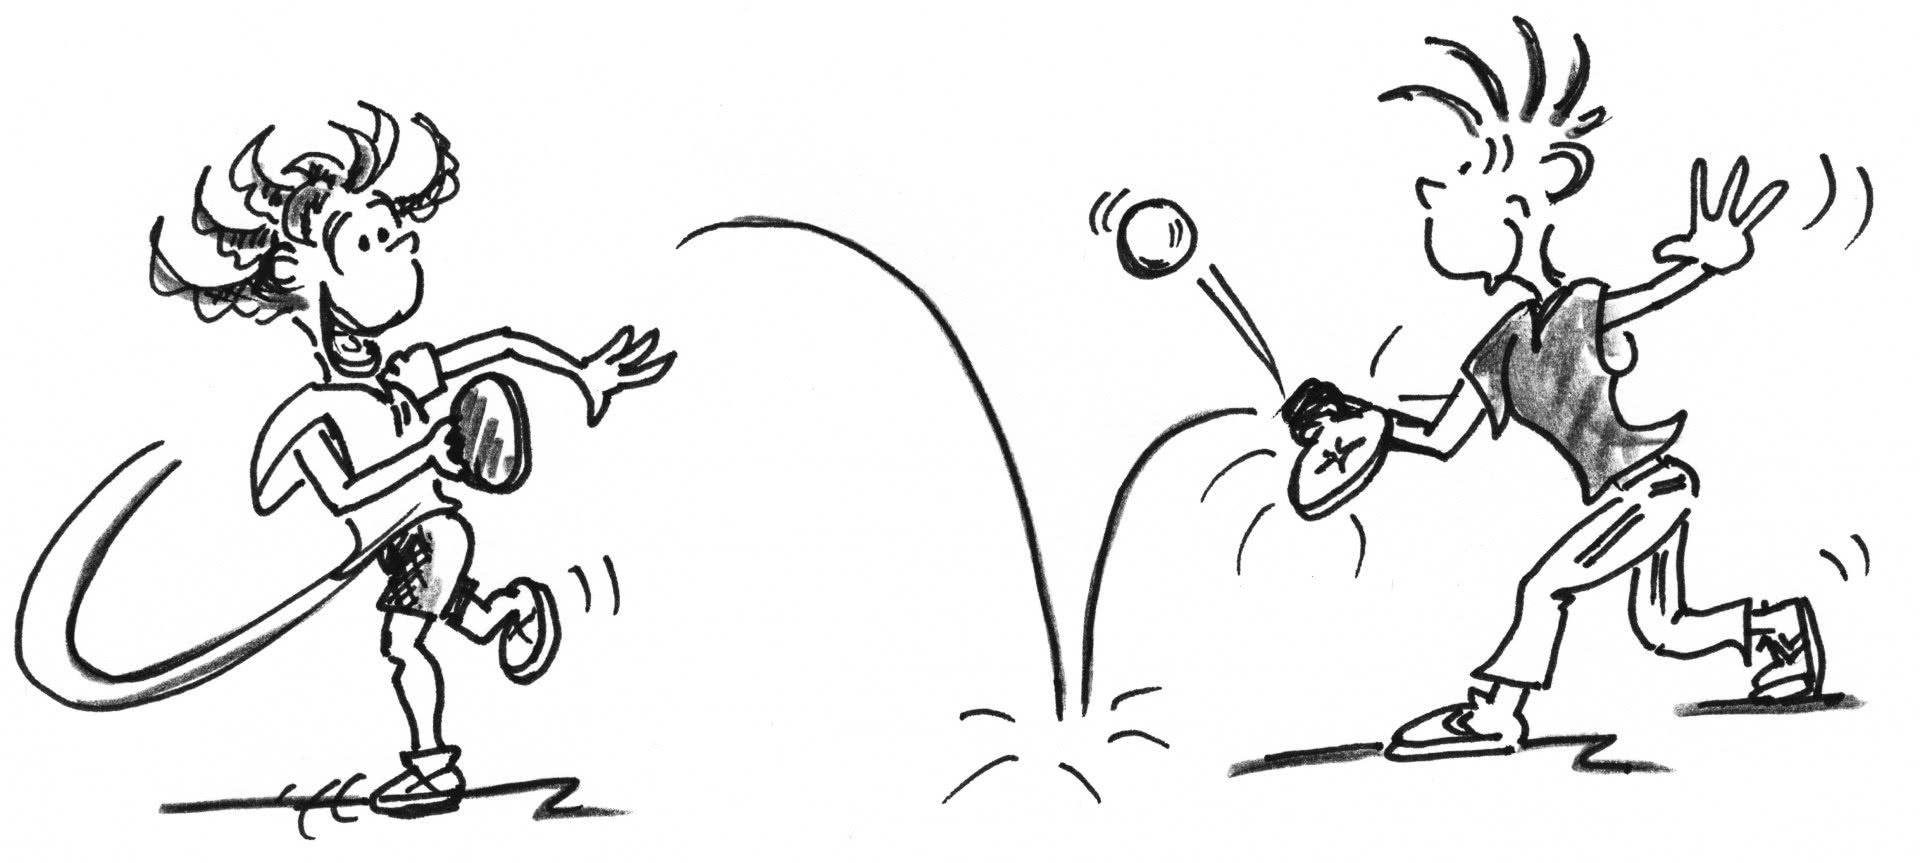 Comic: Zwei Figuren spielen Streetracket.